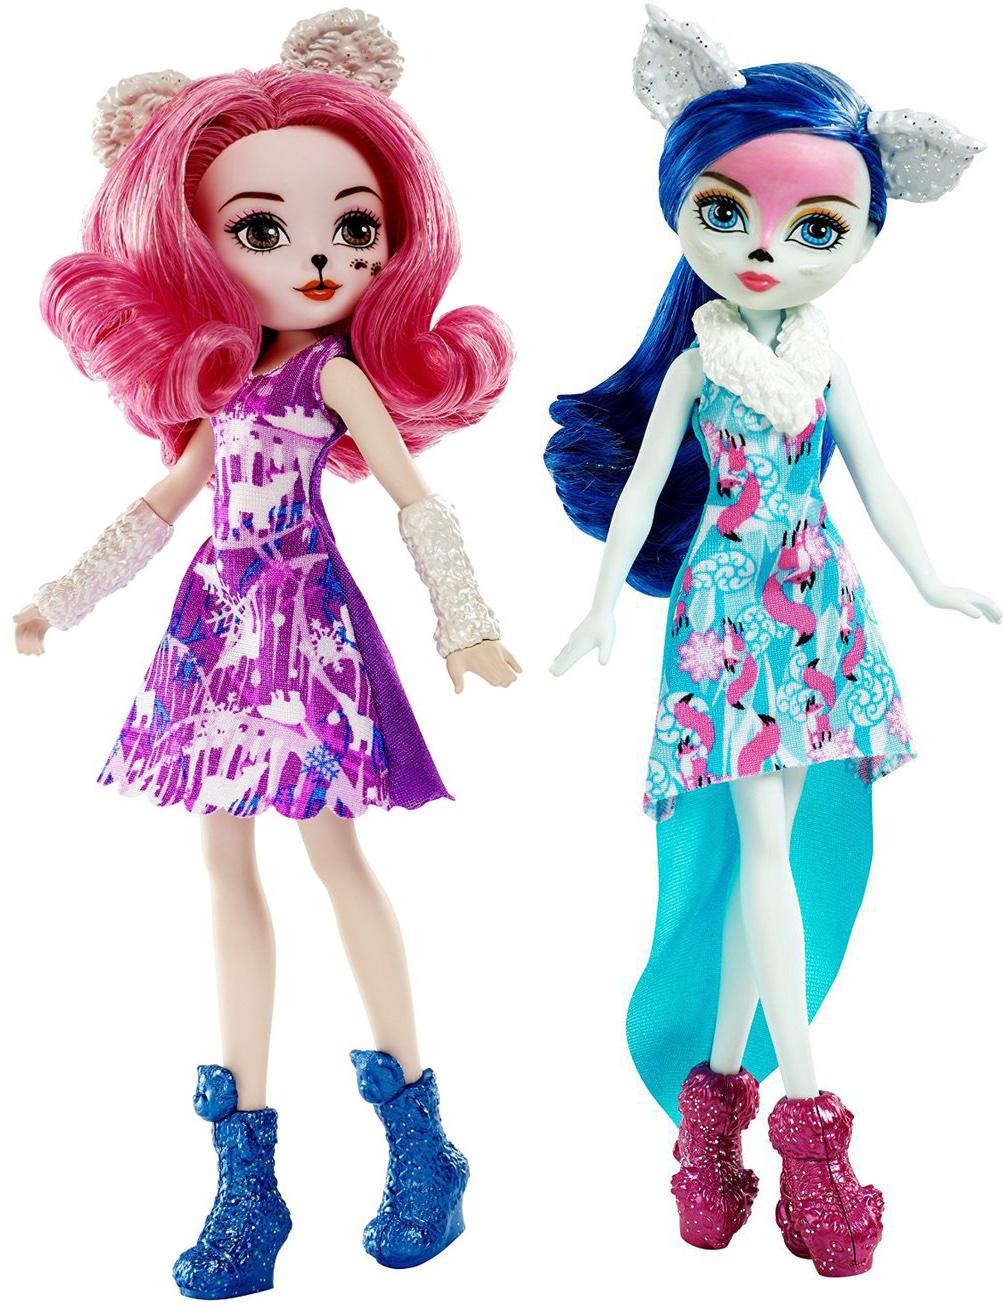 Фото - Кукла Mattel Заколдованная зима mattel ever after high пикси featherly пушинка dhf98